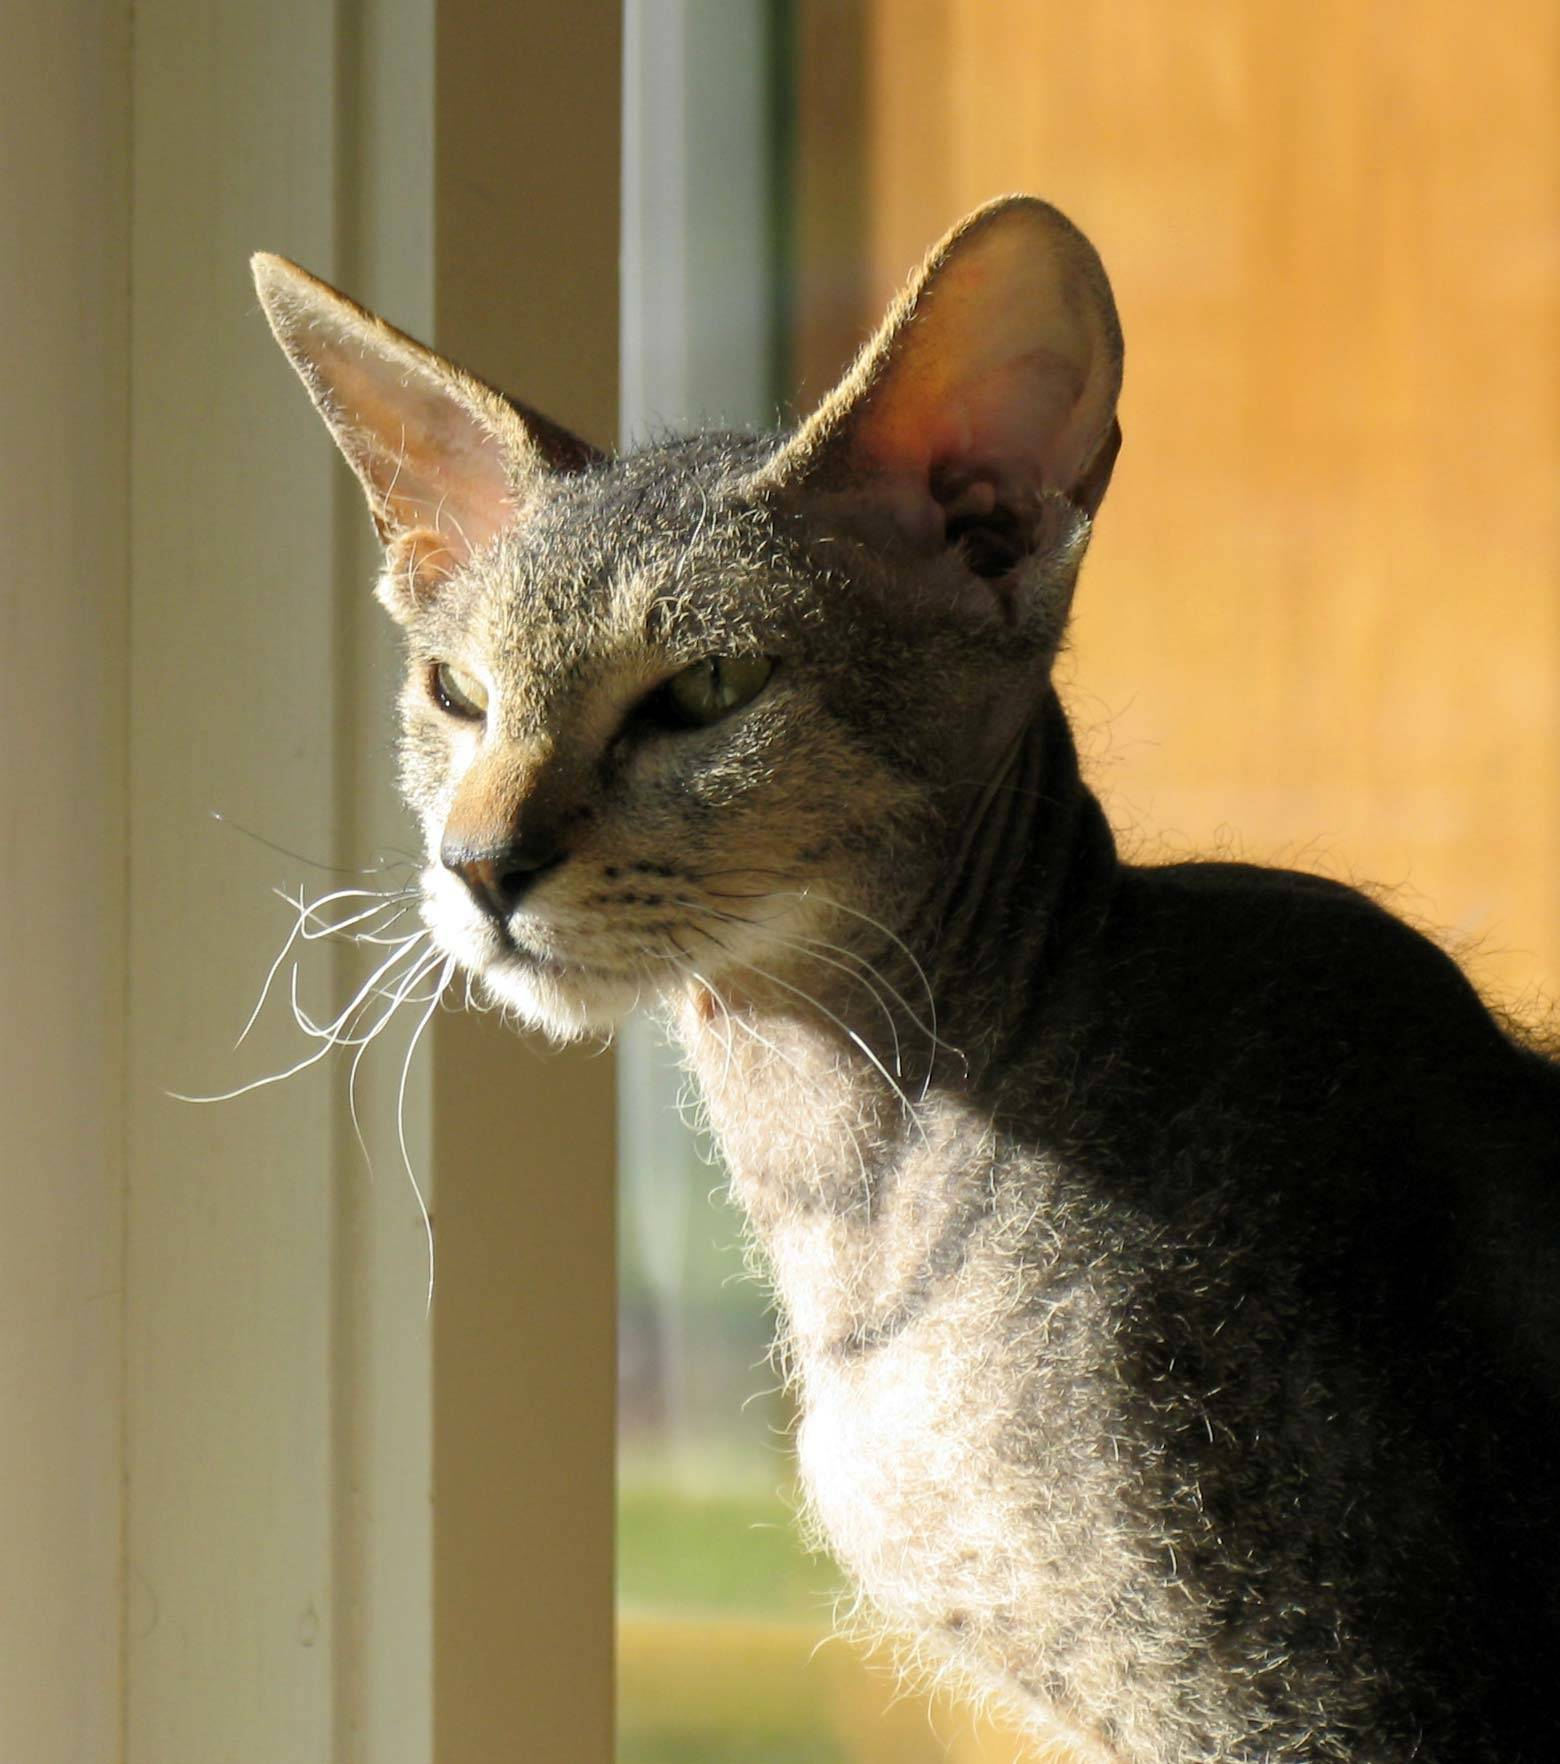 Петерболд: все о кошке, фото, описание породы, характер, цена